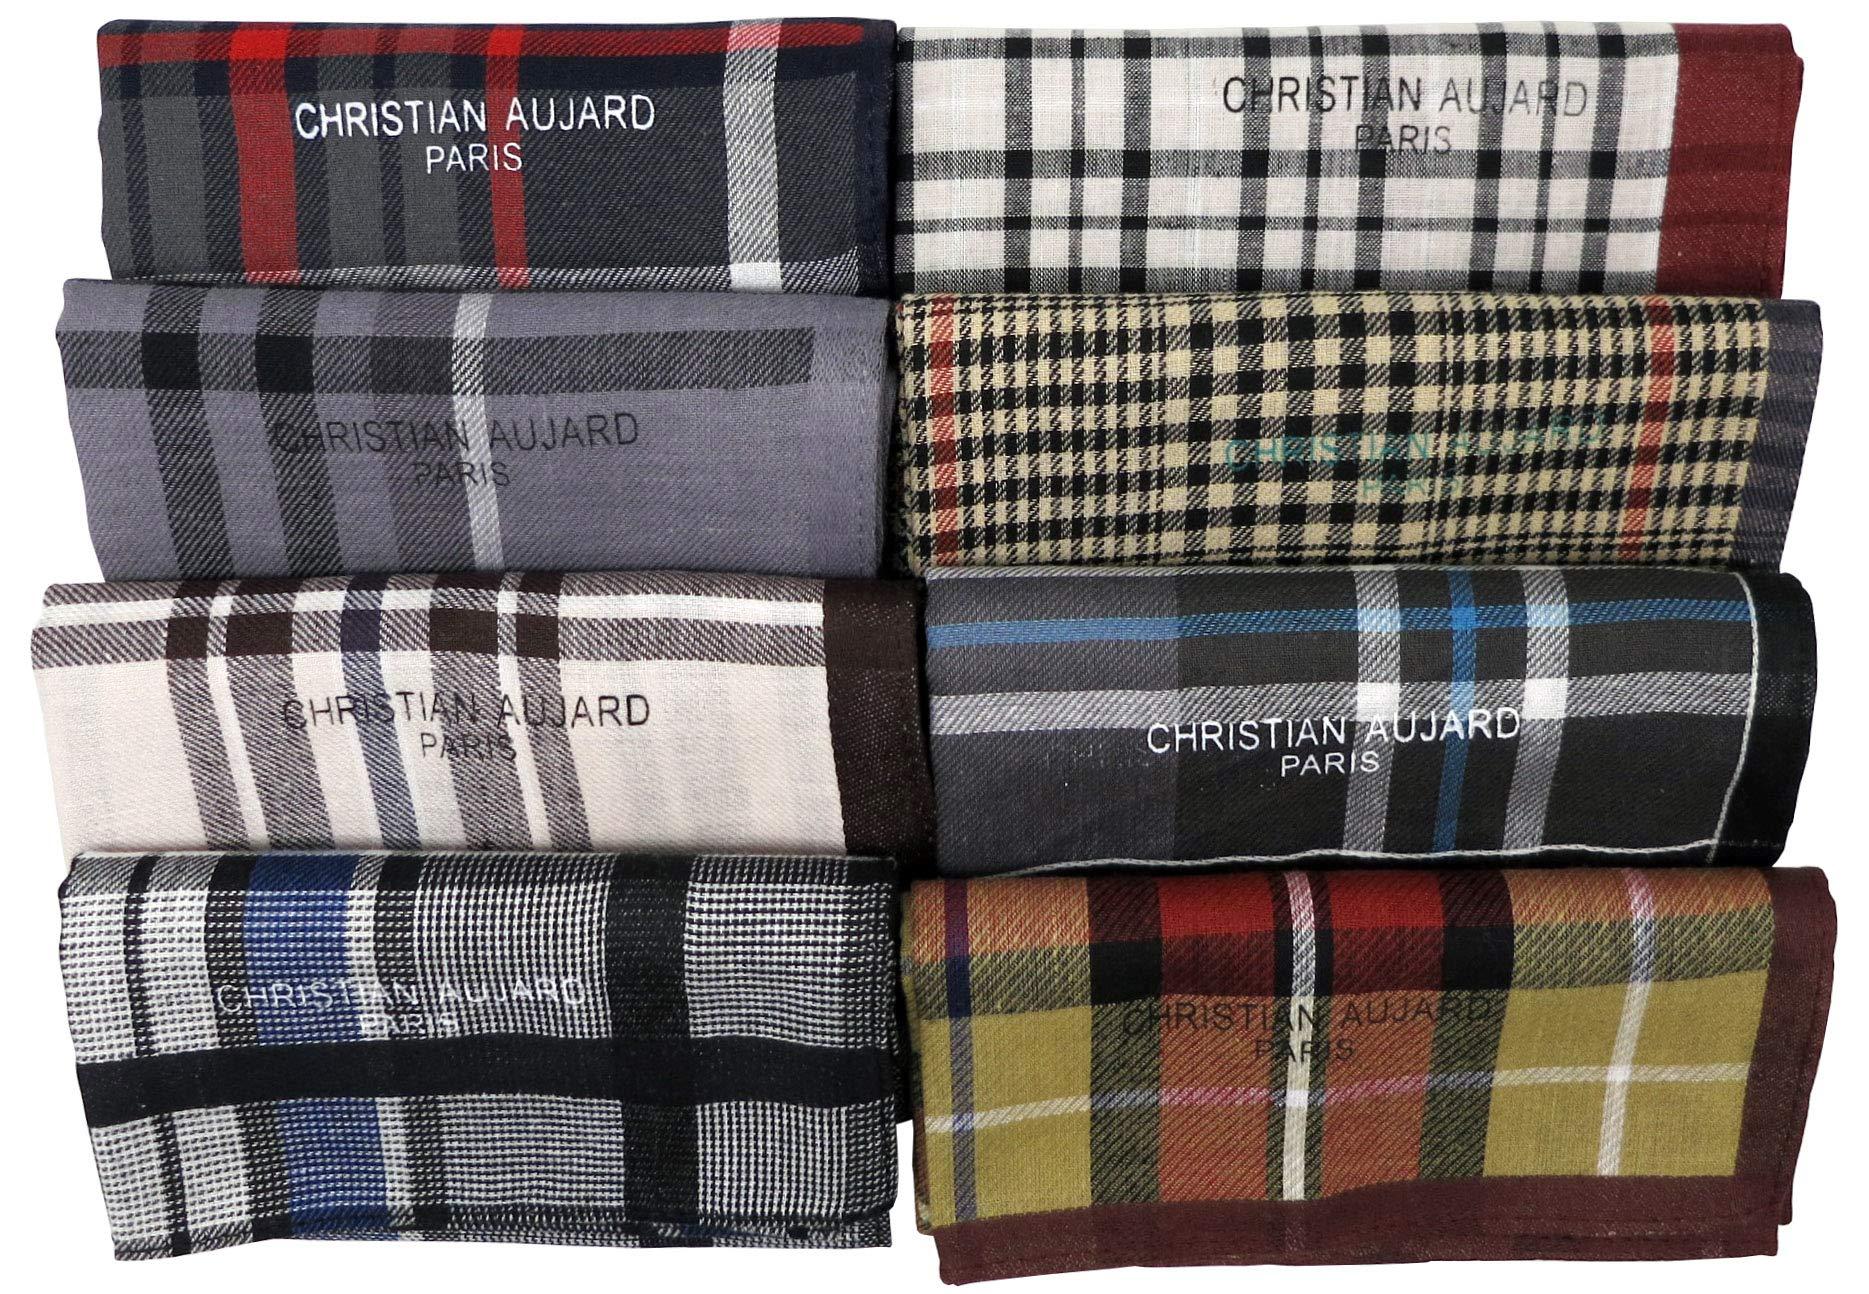 Leevo Handkerchief Men Assorted Woven Cotton 100% Hankies Fashion 8pack Bulk Value Pack (17.5inch 8pack bulk - 4th ver.)